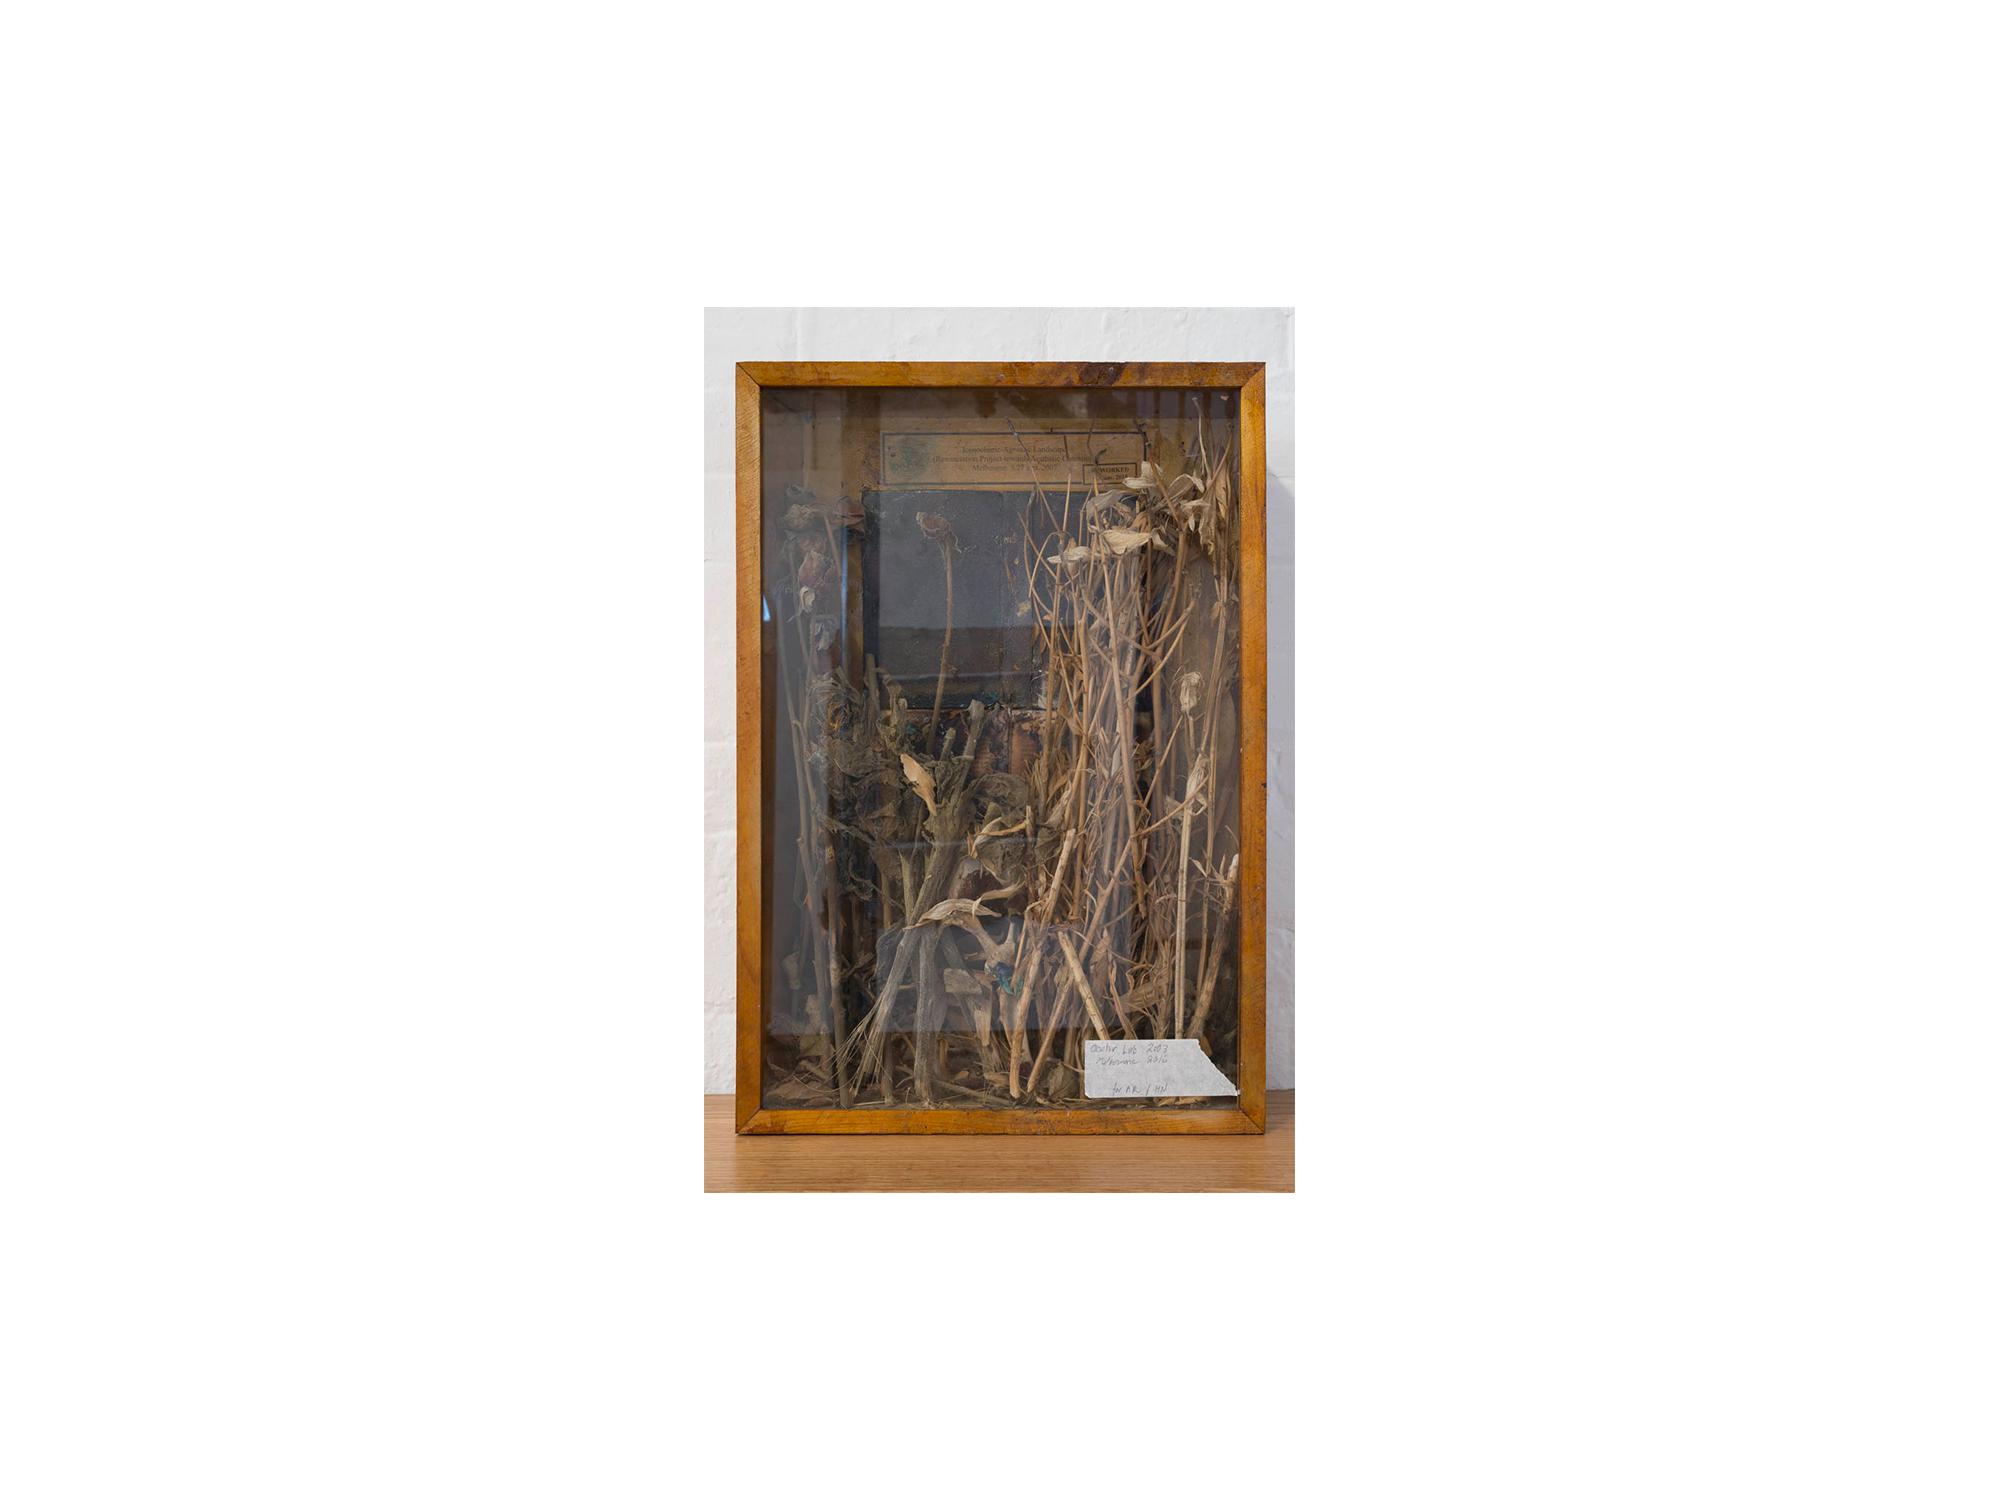 Bernhard Sachs   Iconoclastic-Agnostic Landscape , 2016 mixed media, dried flowers in vitrine 64 x 44 x10cm   ARTIST BIO